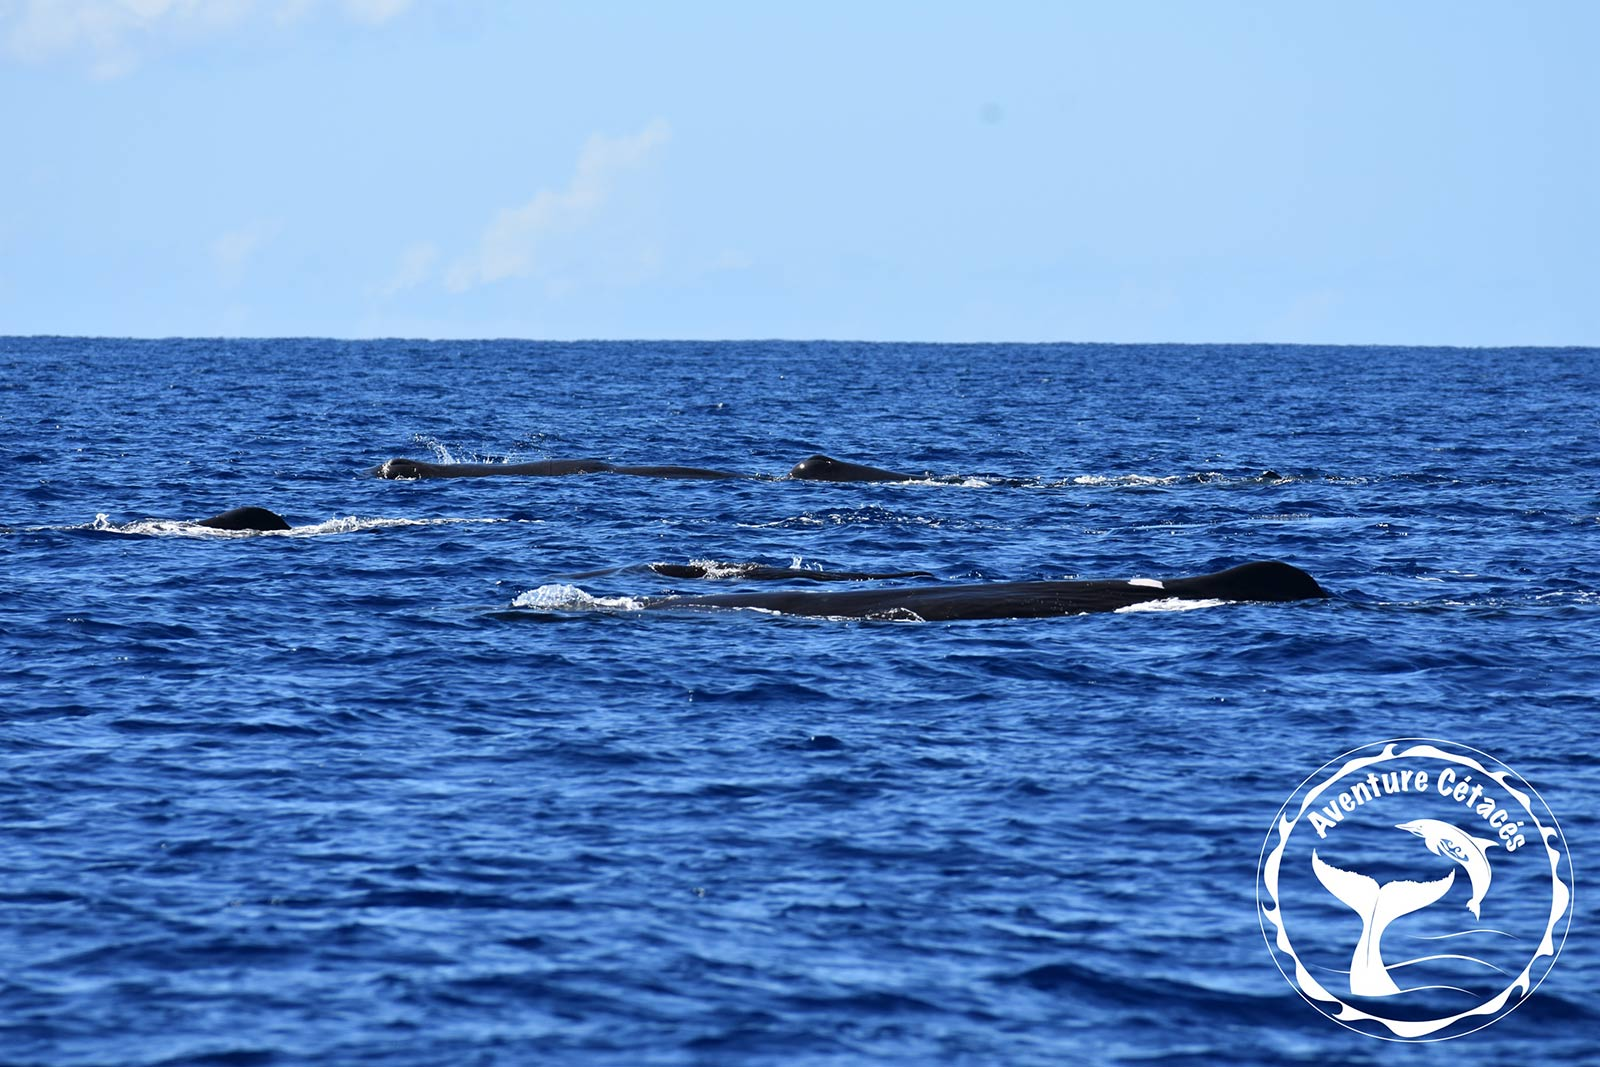 Aventure Cétacés - Baleines